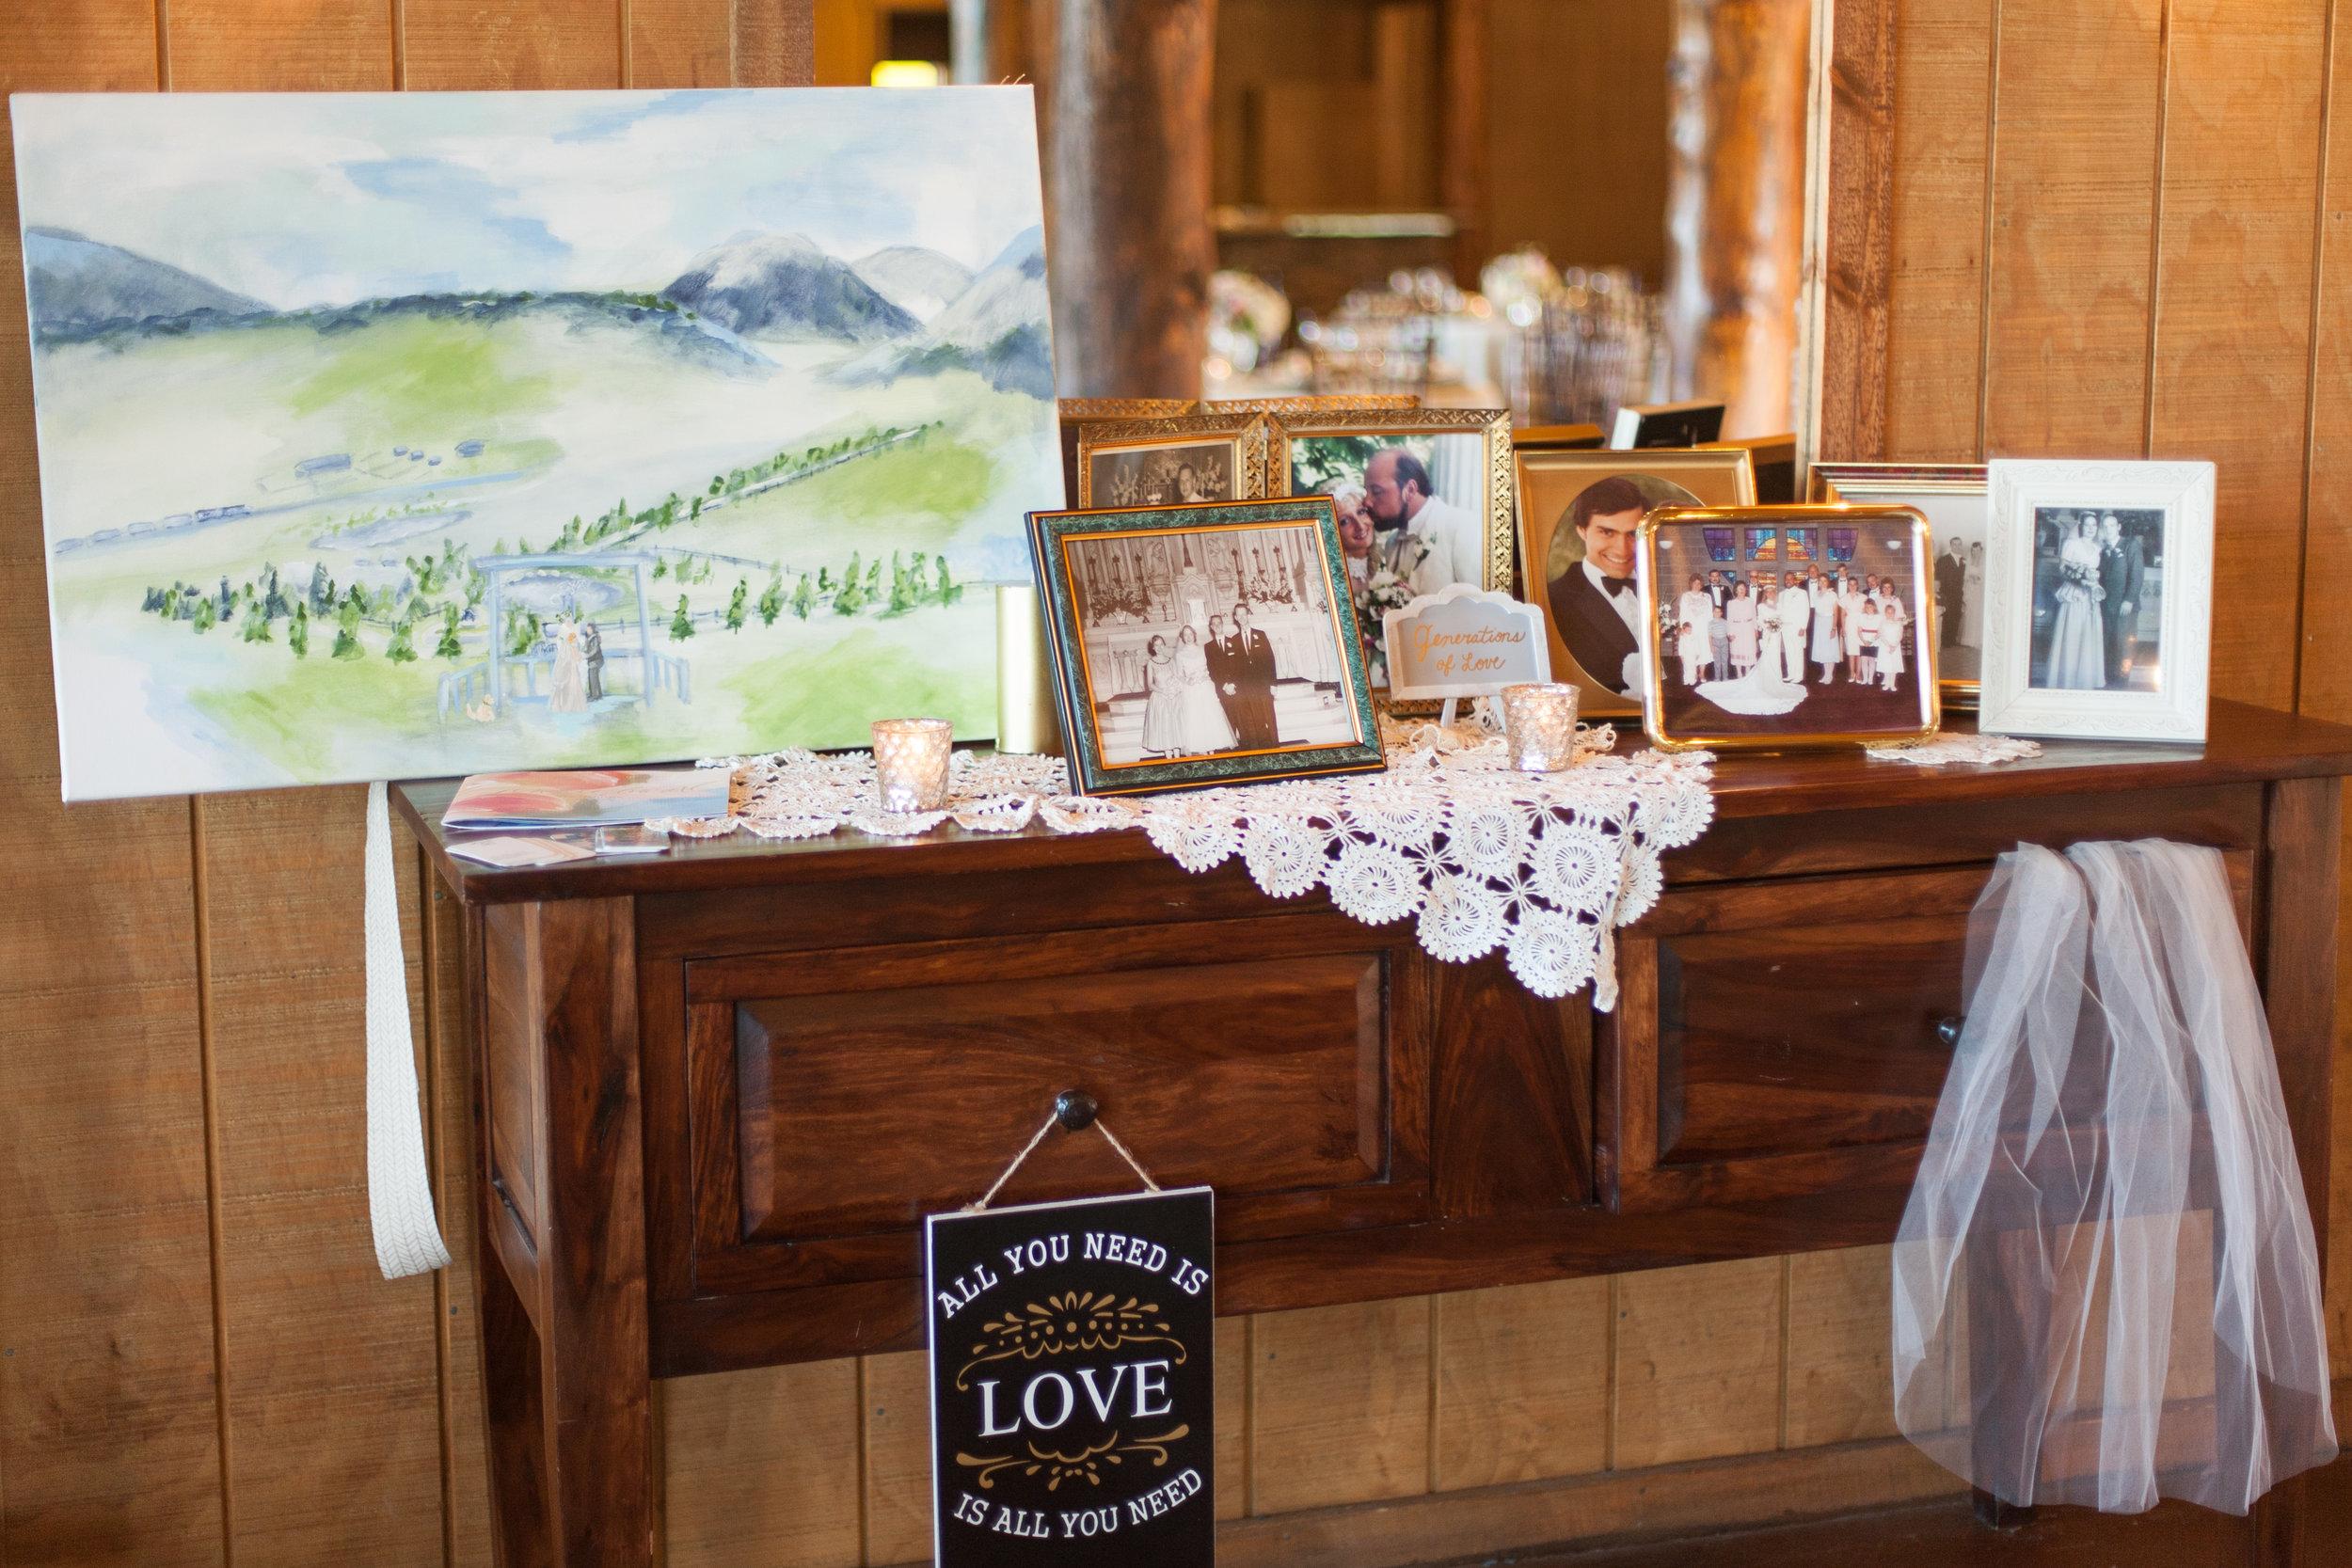 Kyle-Scott-Spruce-Mountain-wedding-by-Lisa-O'Dwyer-662.jpg